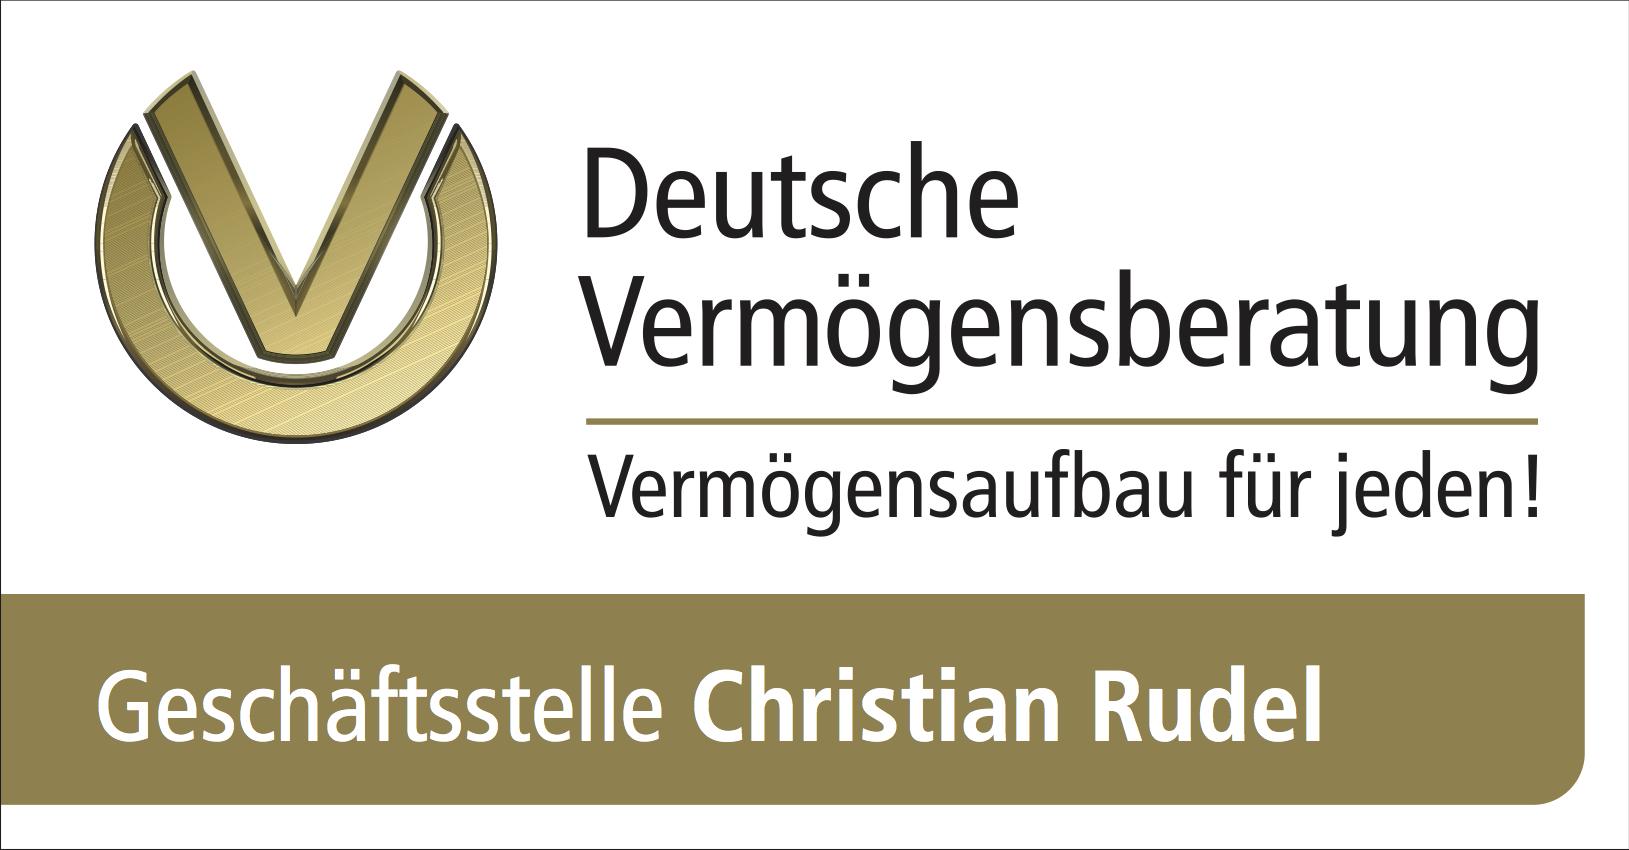 Christian Rudel